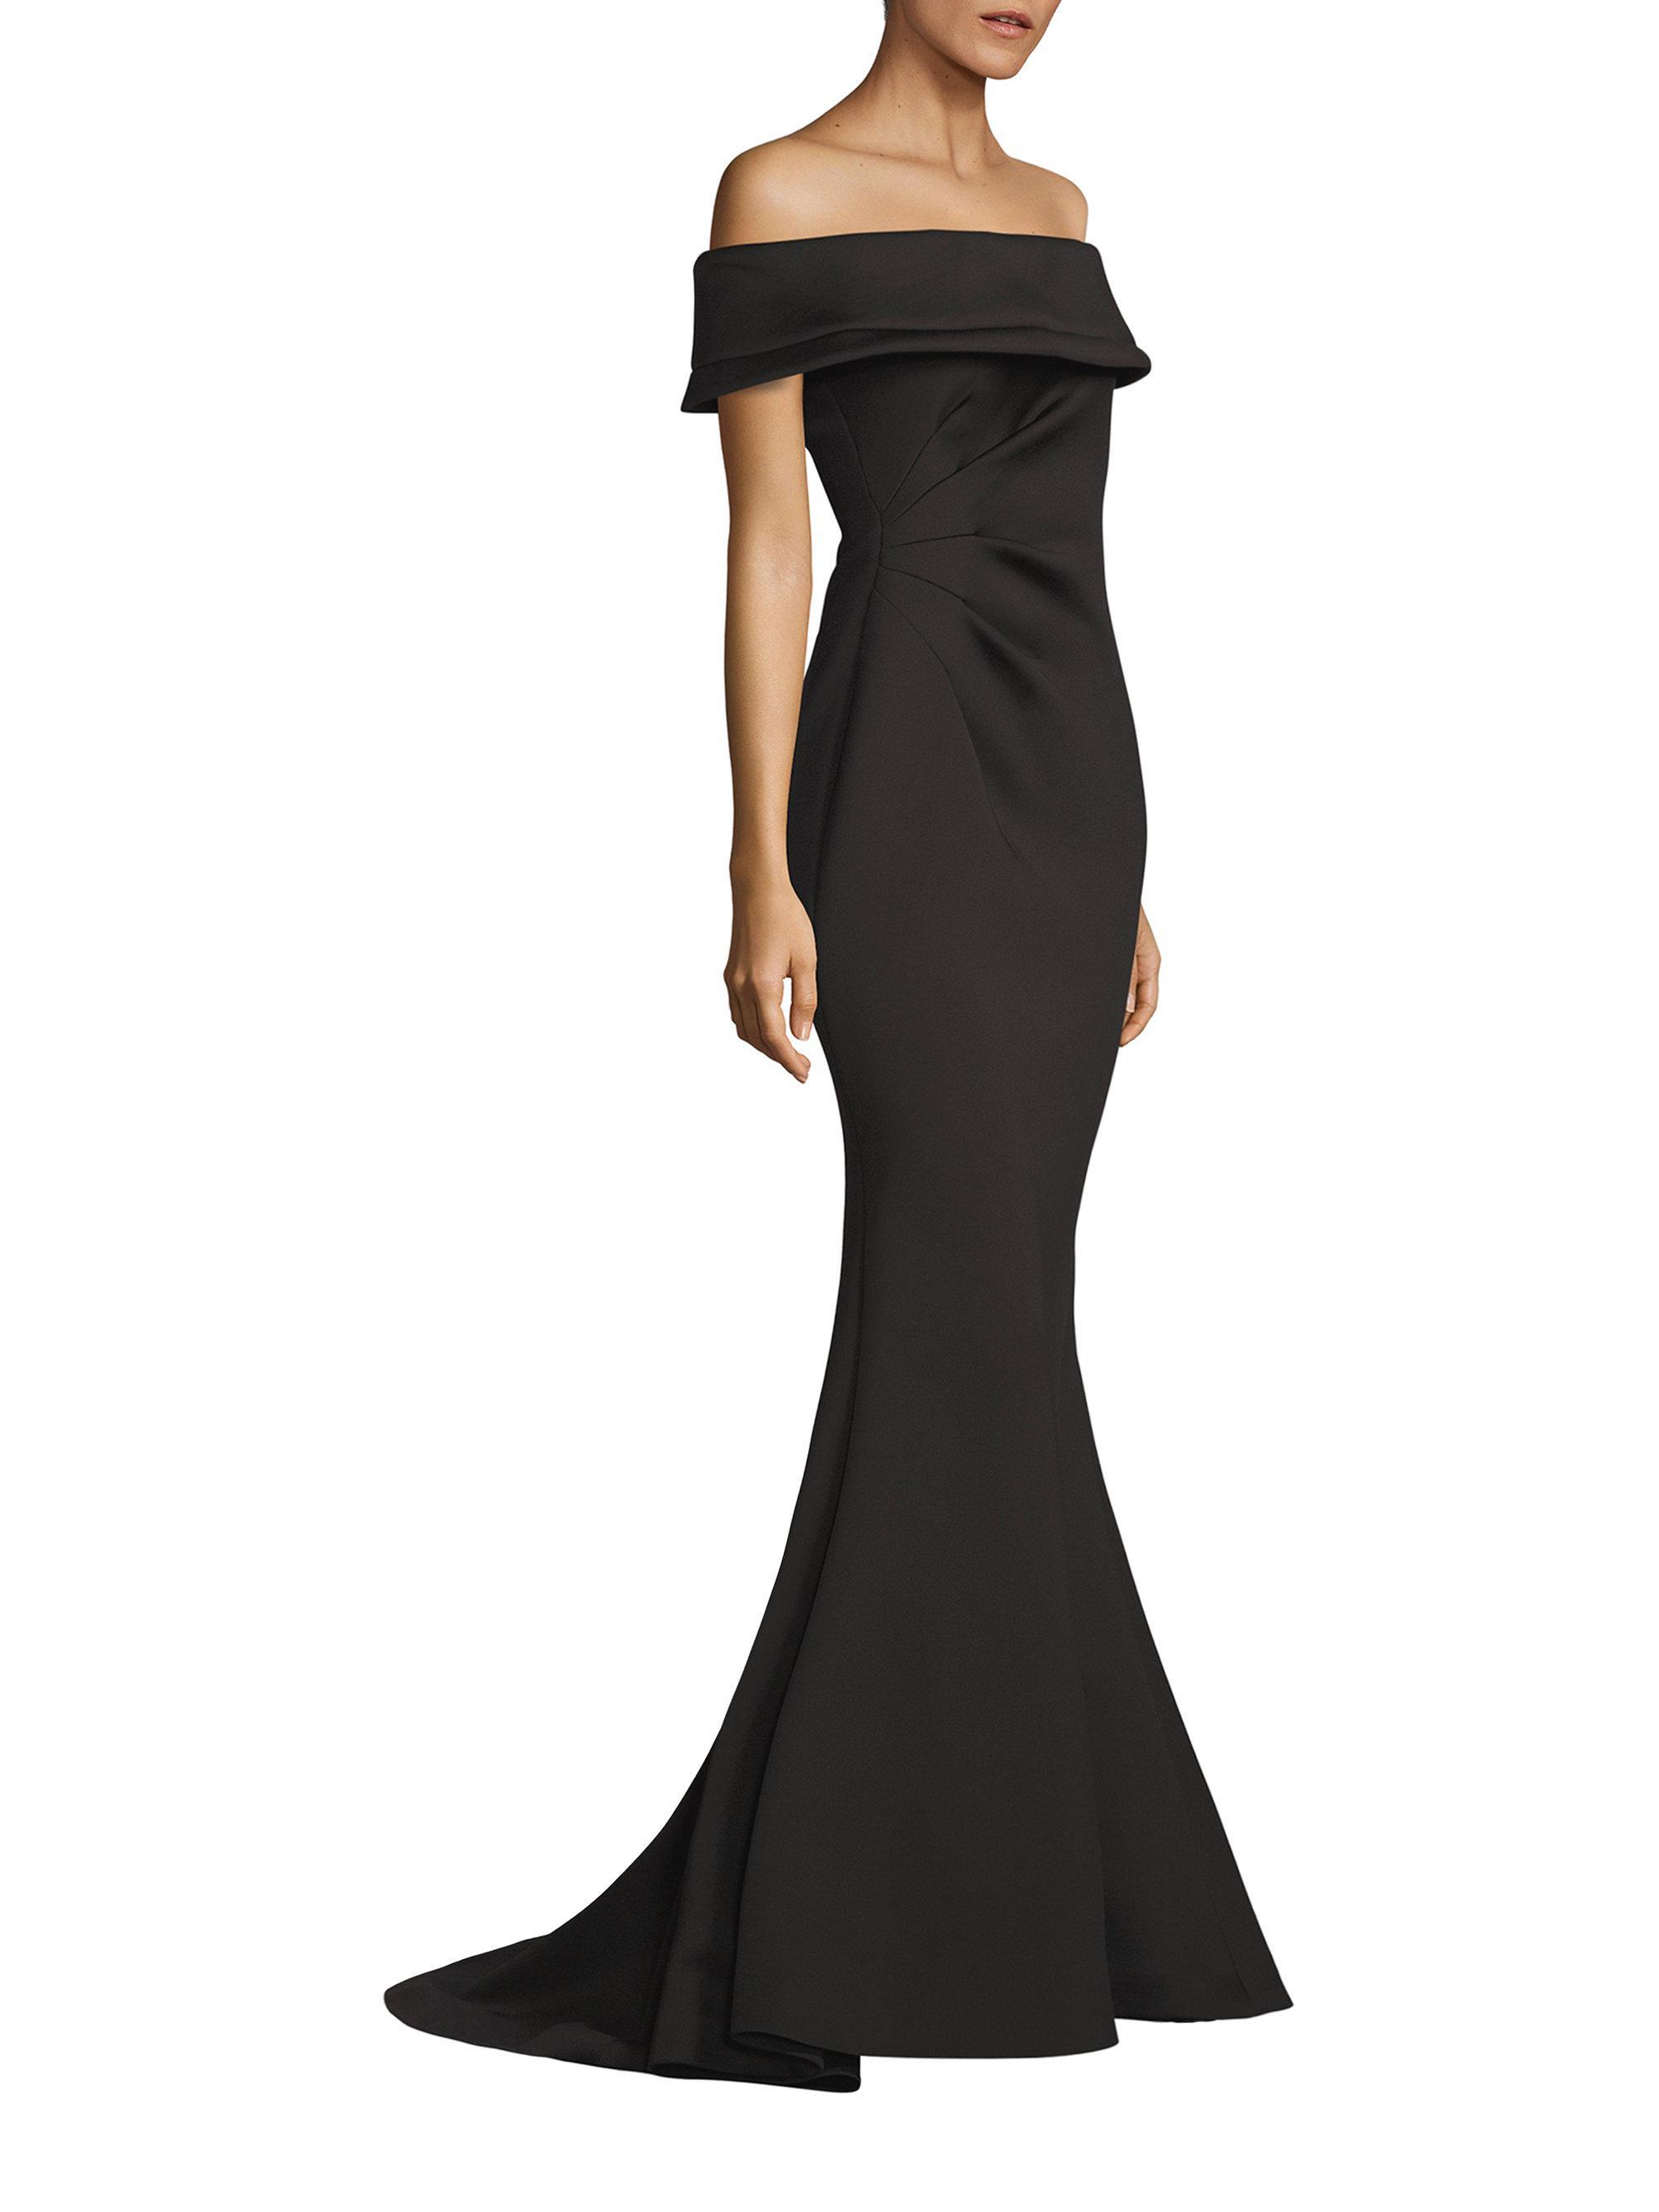 Lyst - Jovani Scuba Evening Gown in Black